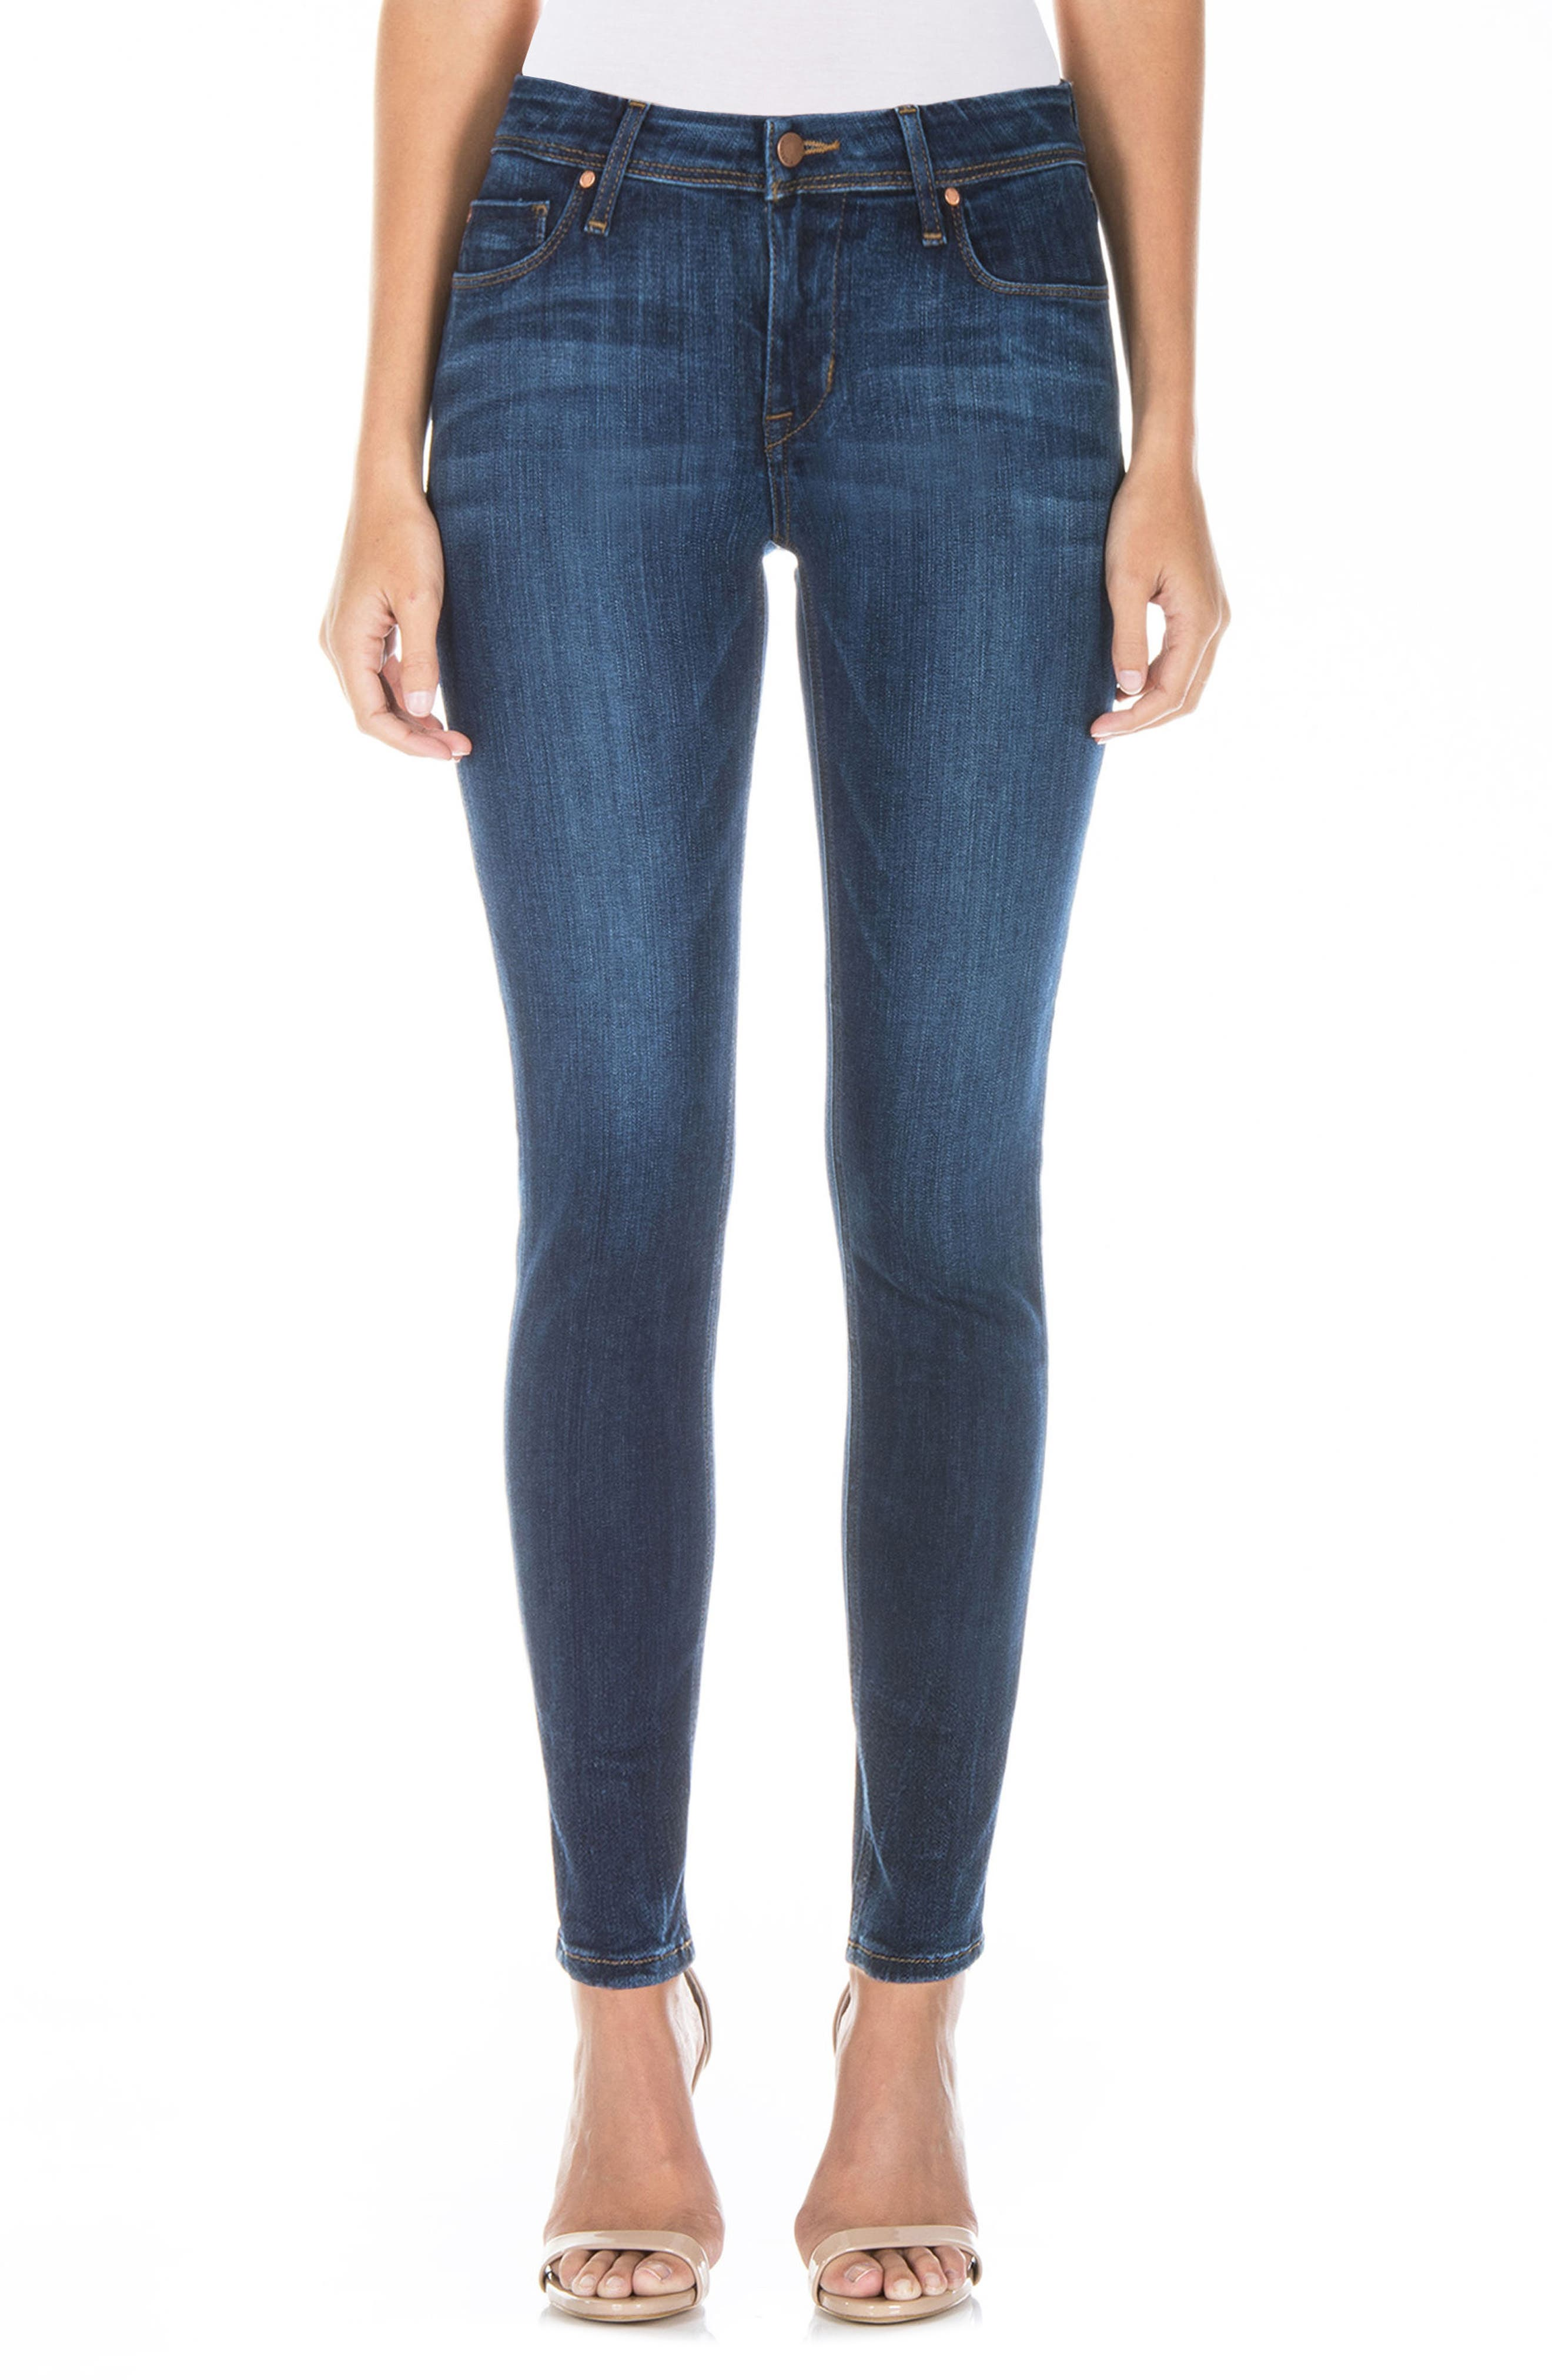 Gwen High Waist Skinny Jeans,                             Main thumbnail 1, color,                             Falcon Blue